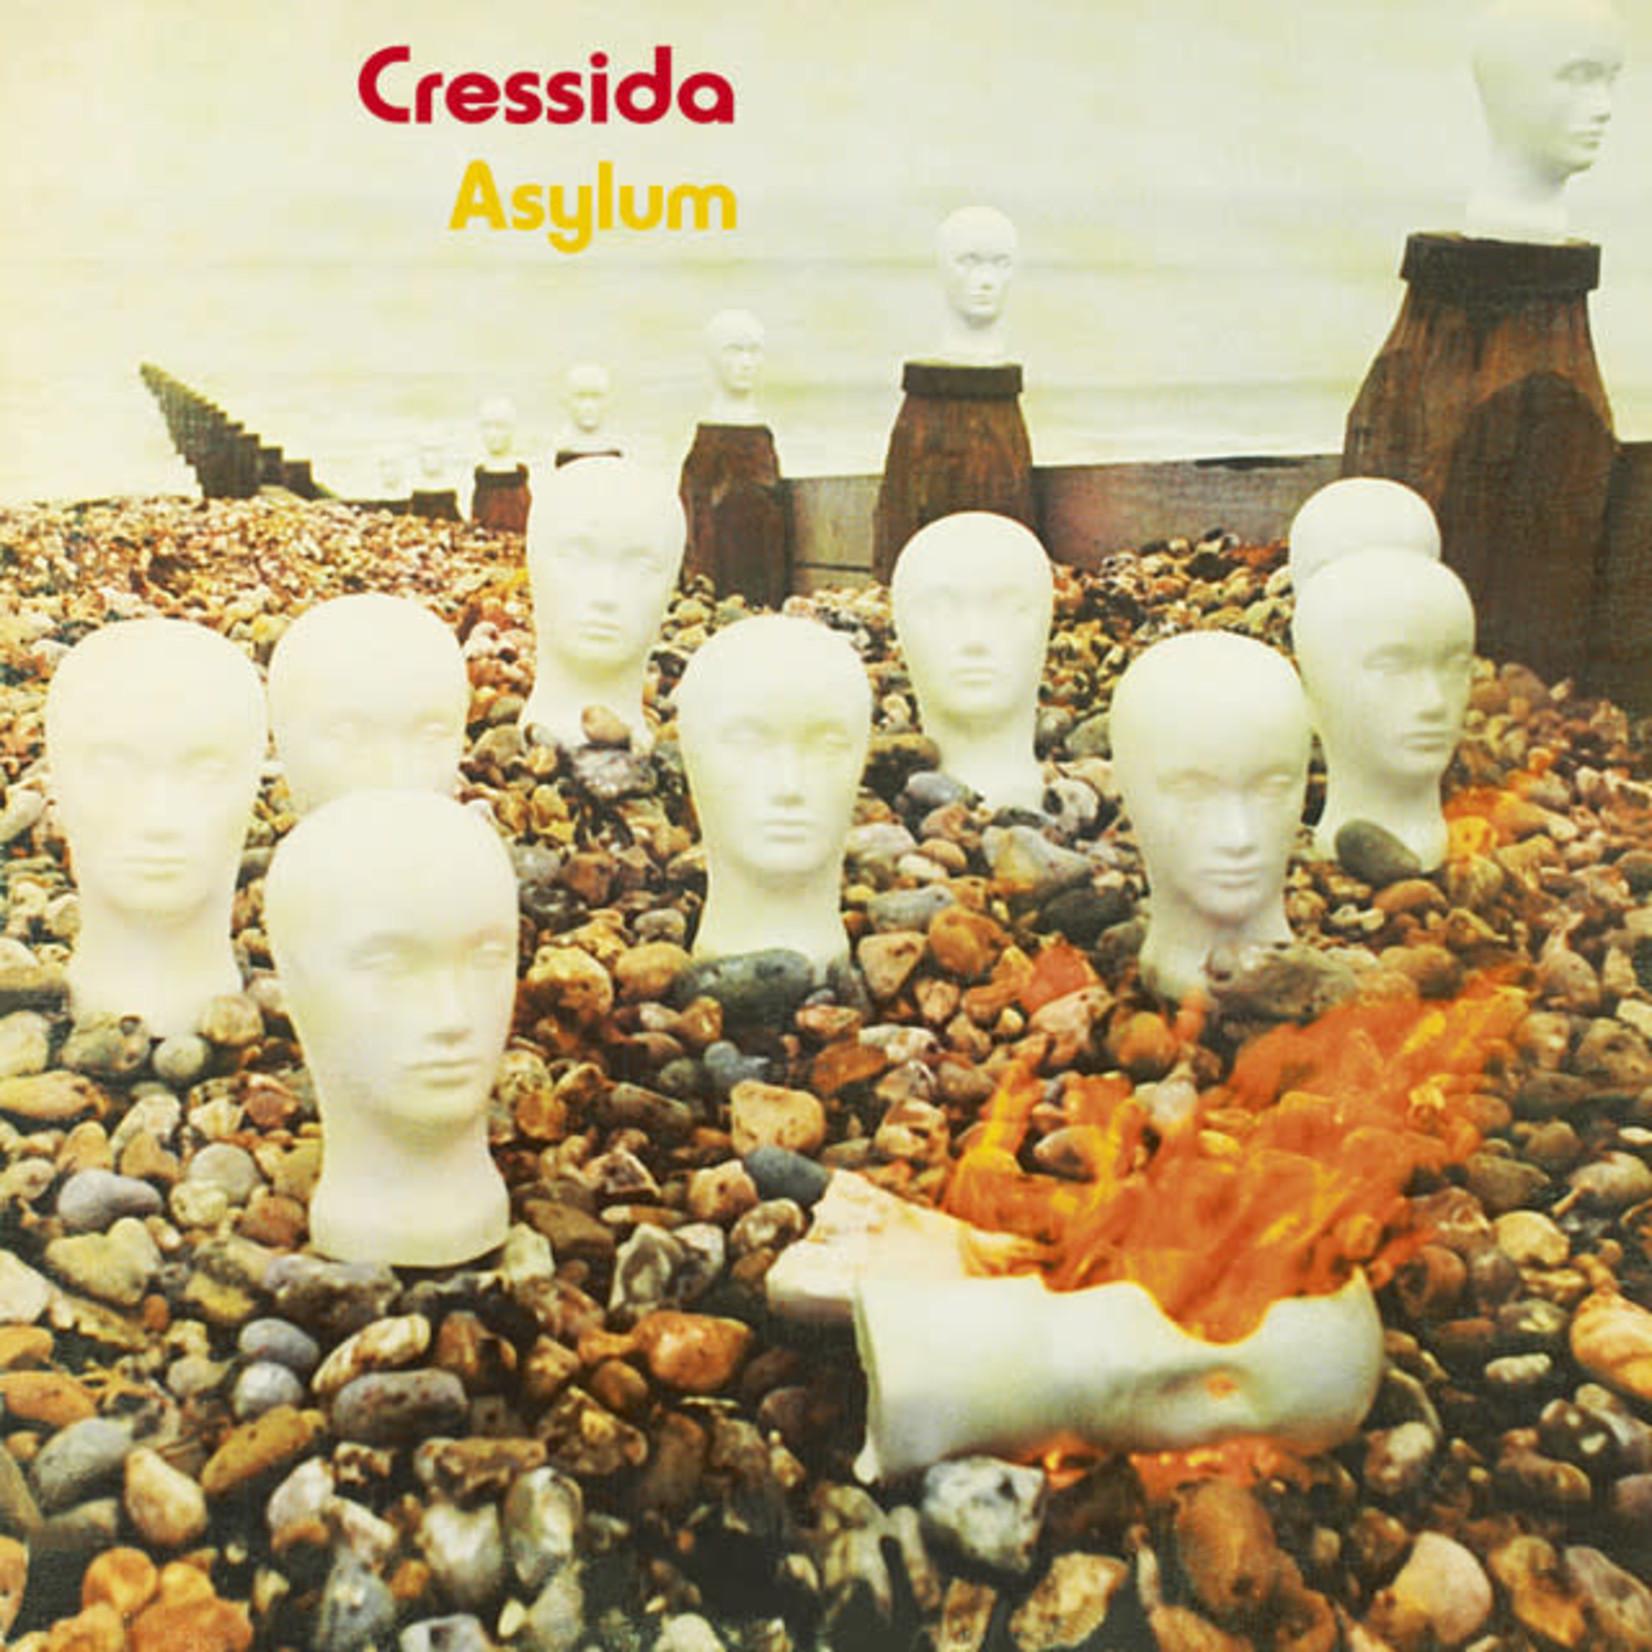 Vinyl Cressida - Asylum